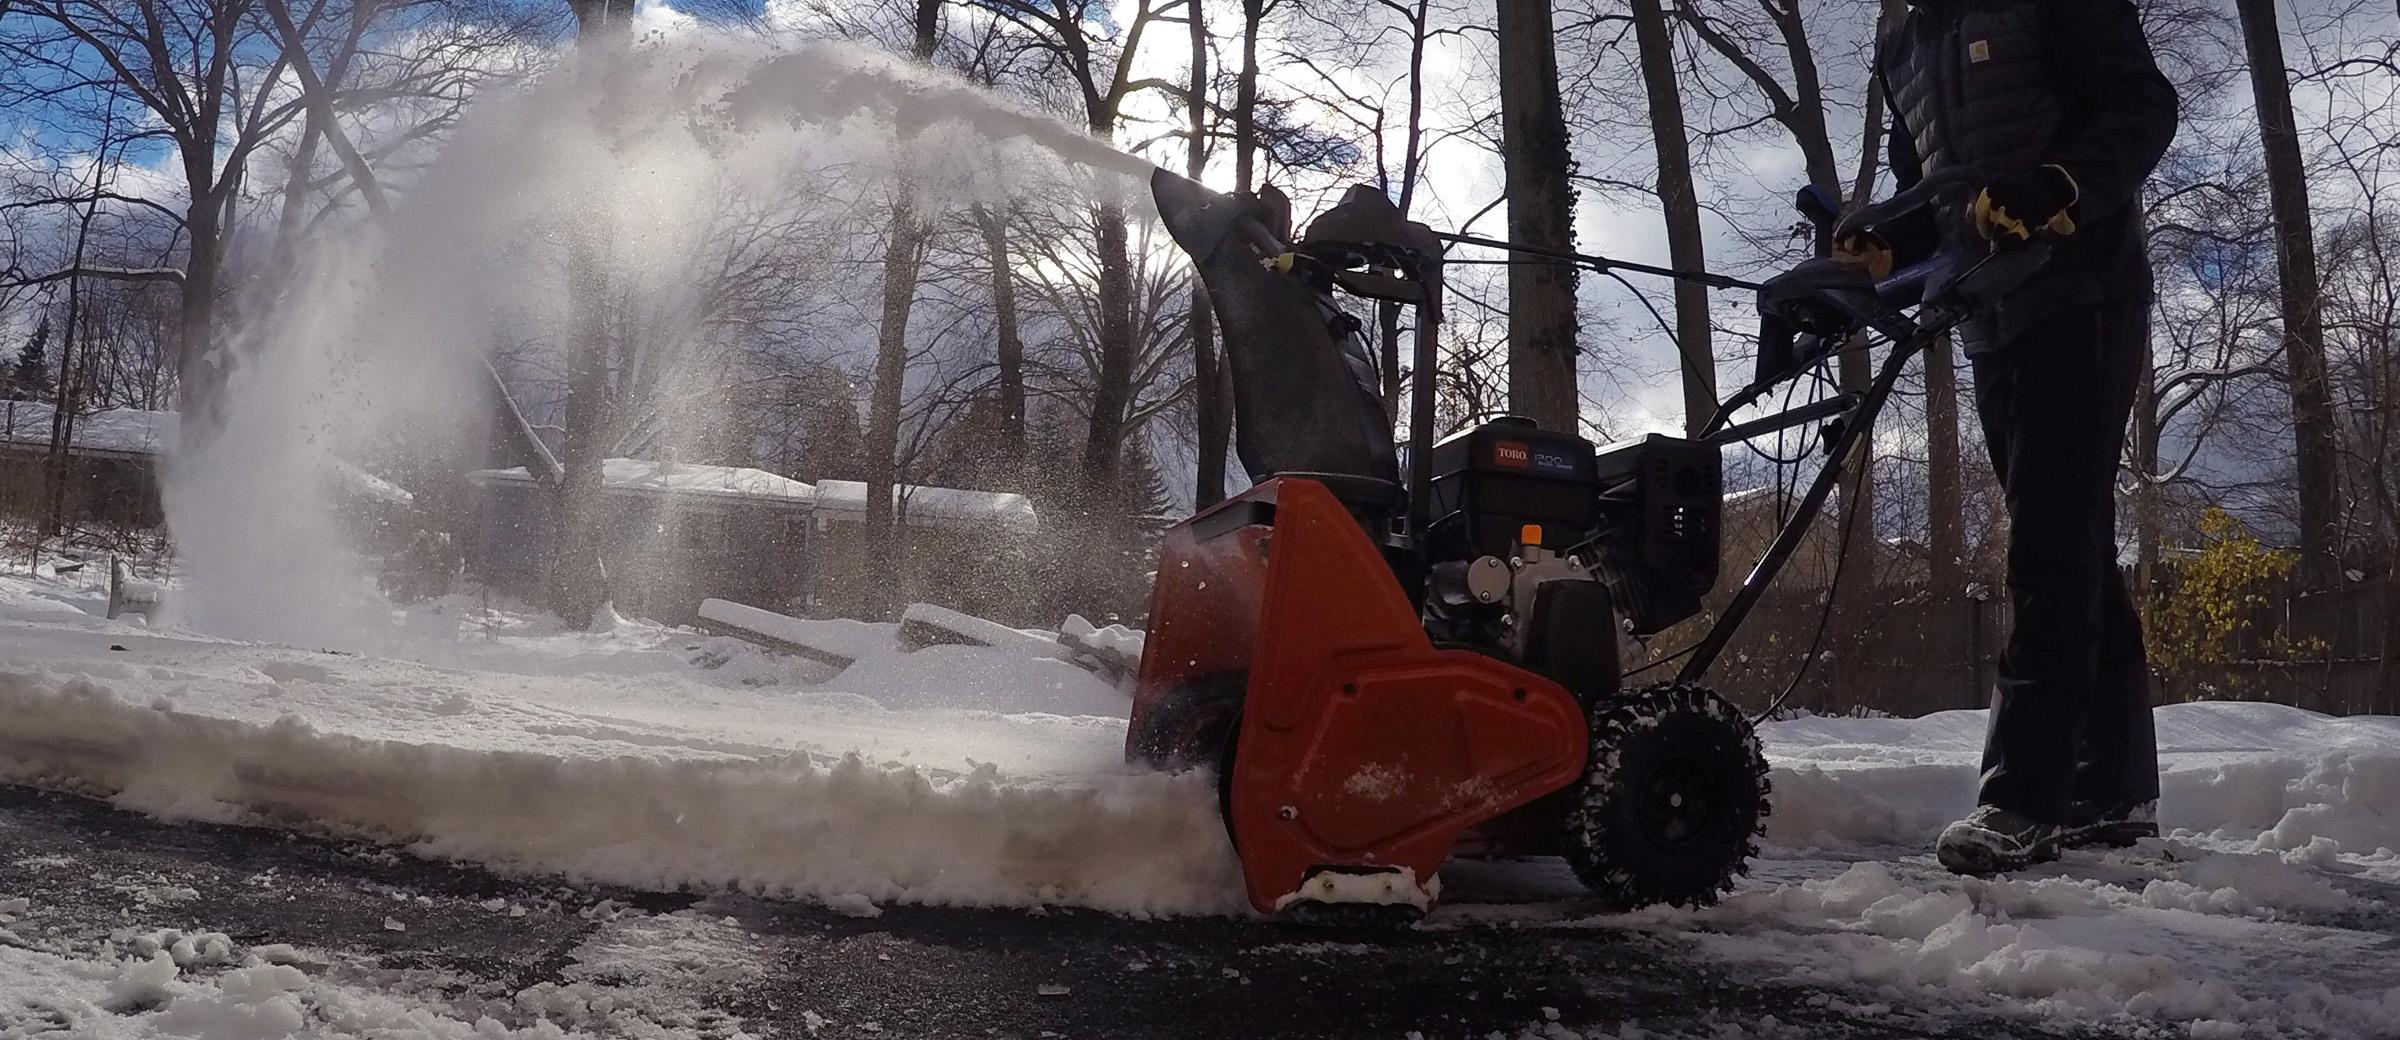 Toro Snowmaster 824 Qxe